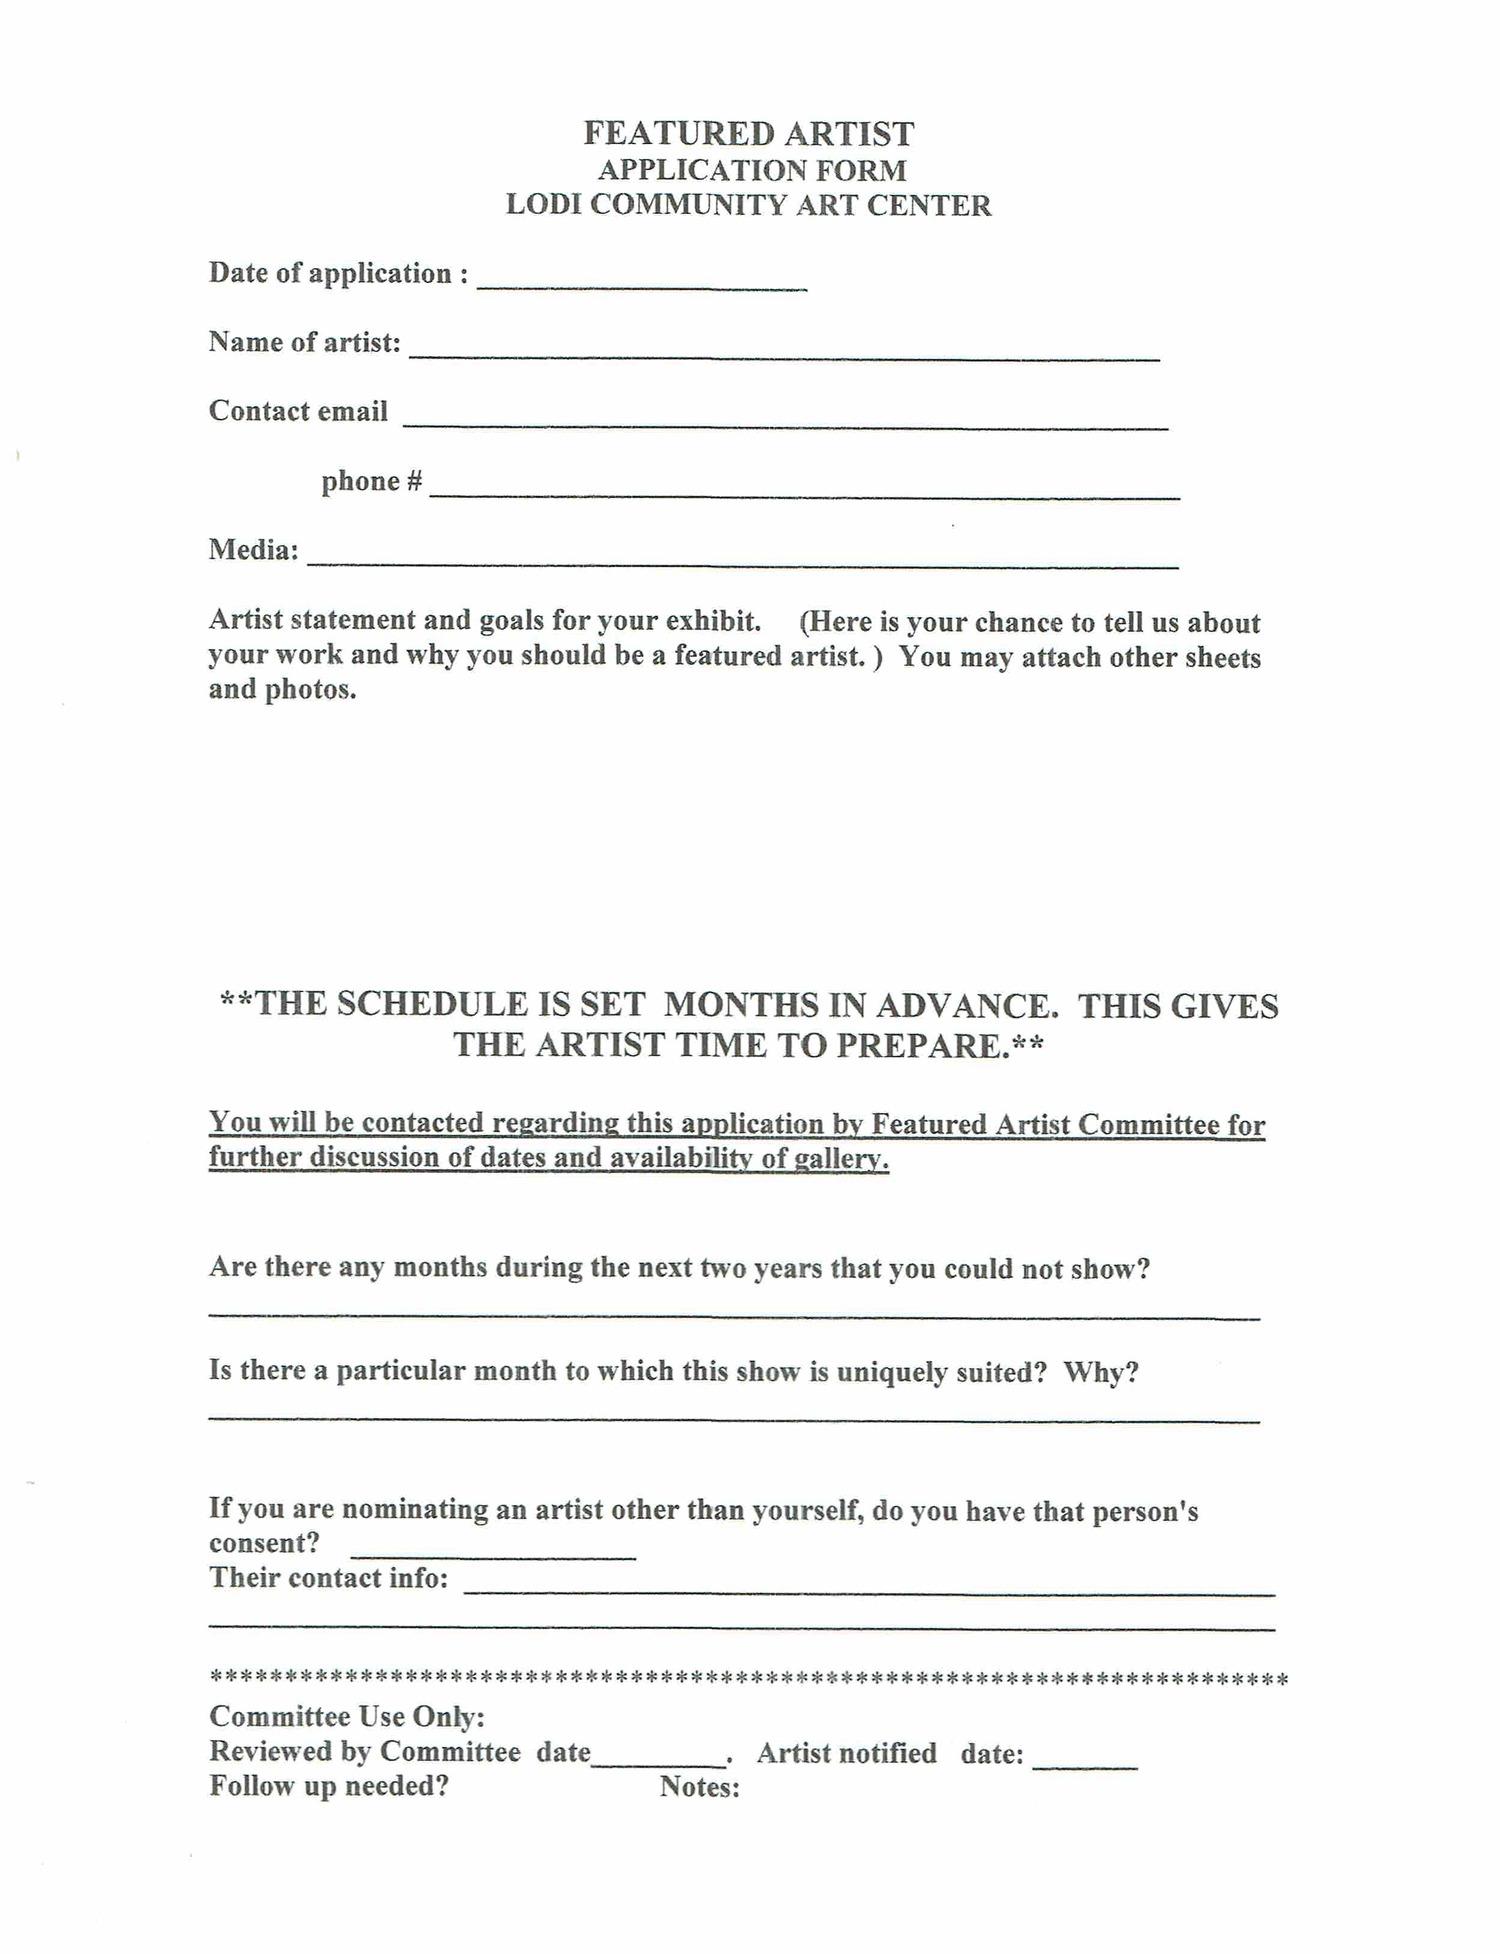 Featured Artist Application Form